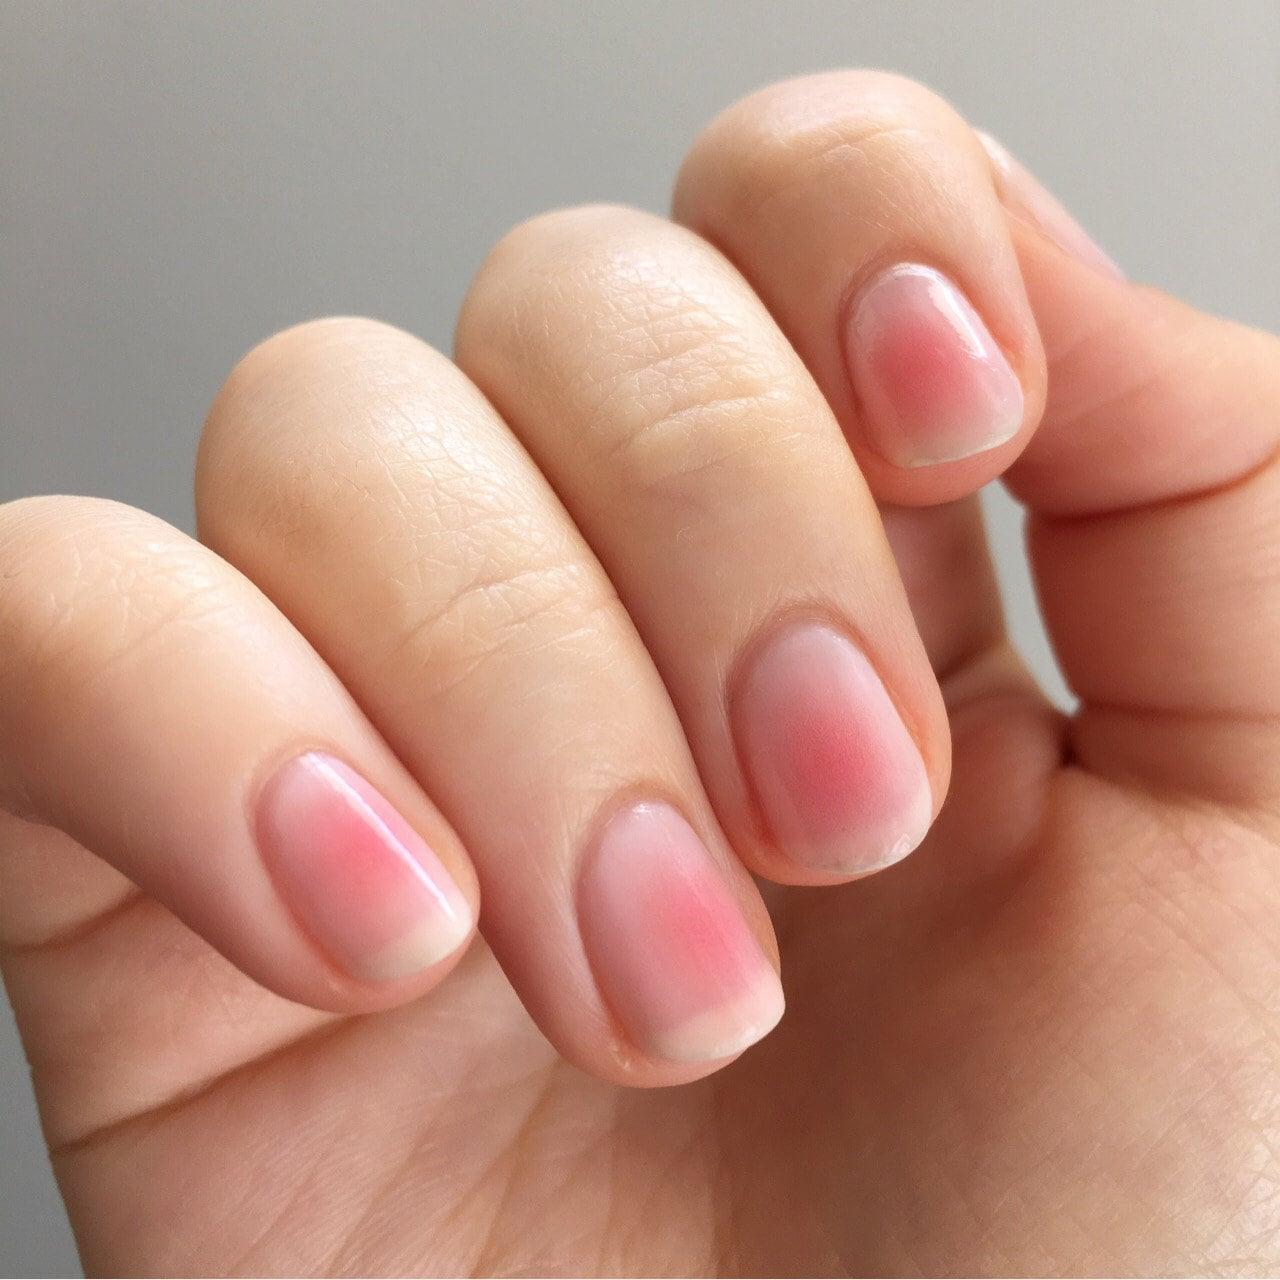 Beautiful Japan Nails Design Vignette - Nail Art Ideas - morihati.com